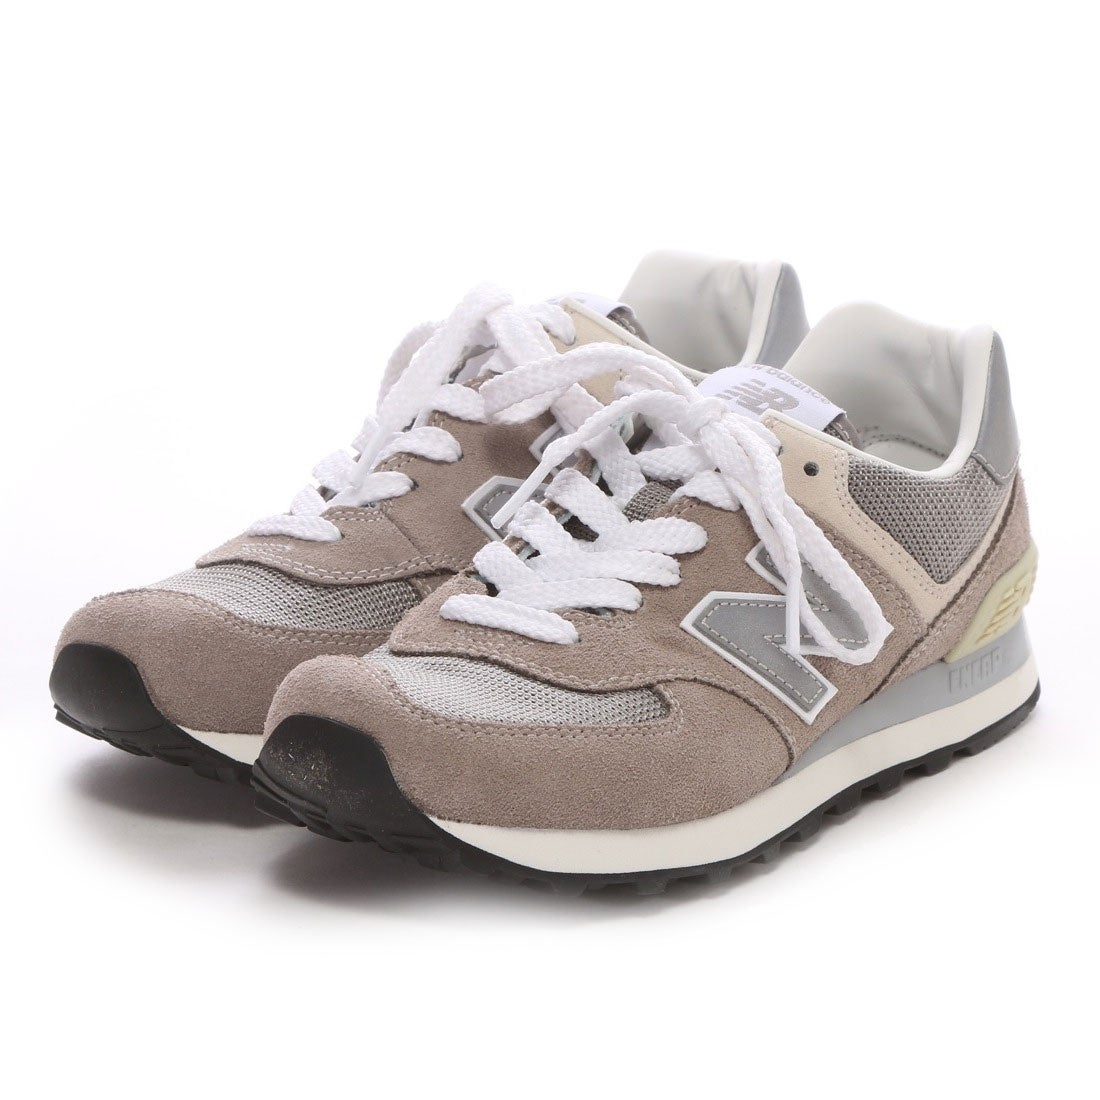 6376cbe7787ef ニューバランス new balance NB ML574 VG (グレー) -靴&ファッション通販 ロコンド〜自宅で試着、気軽に返品